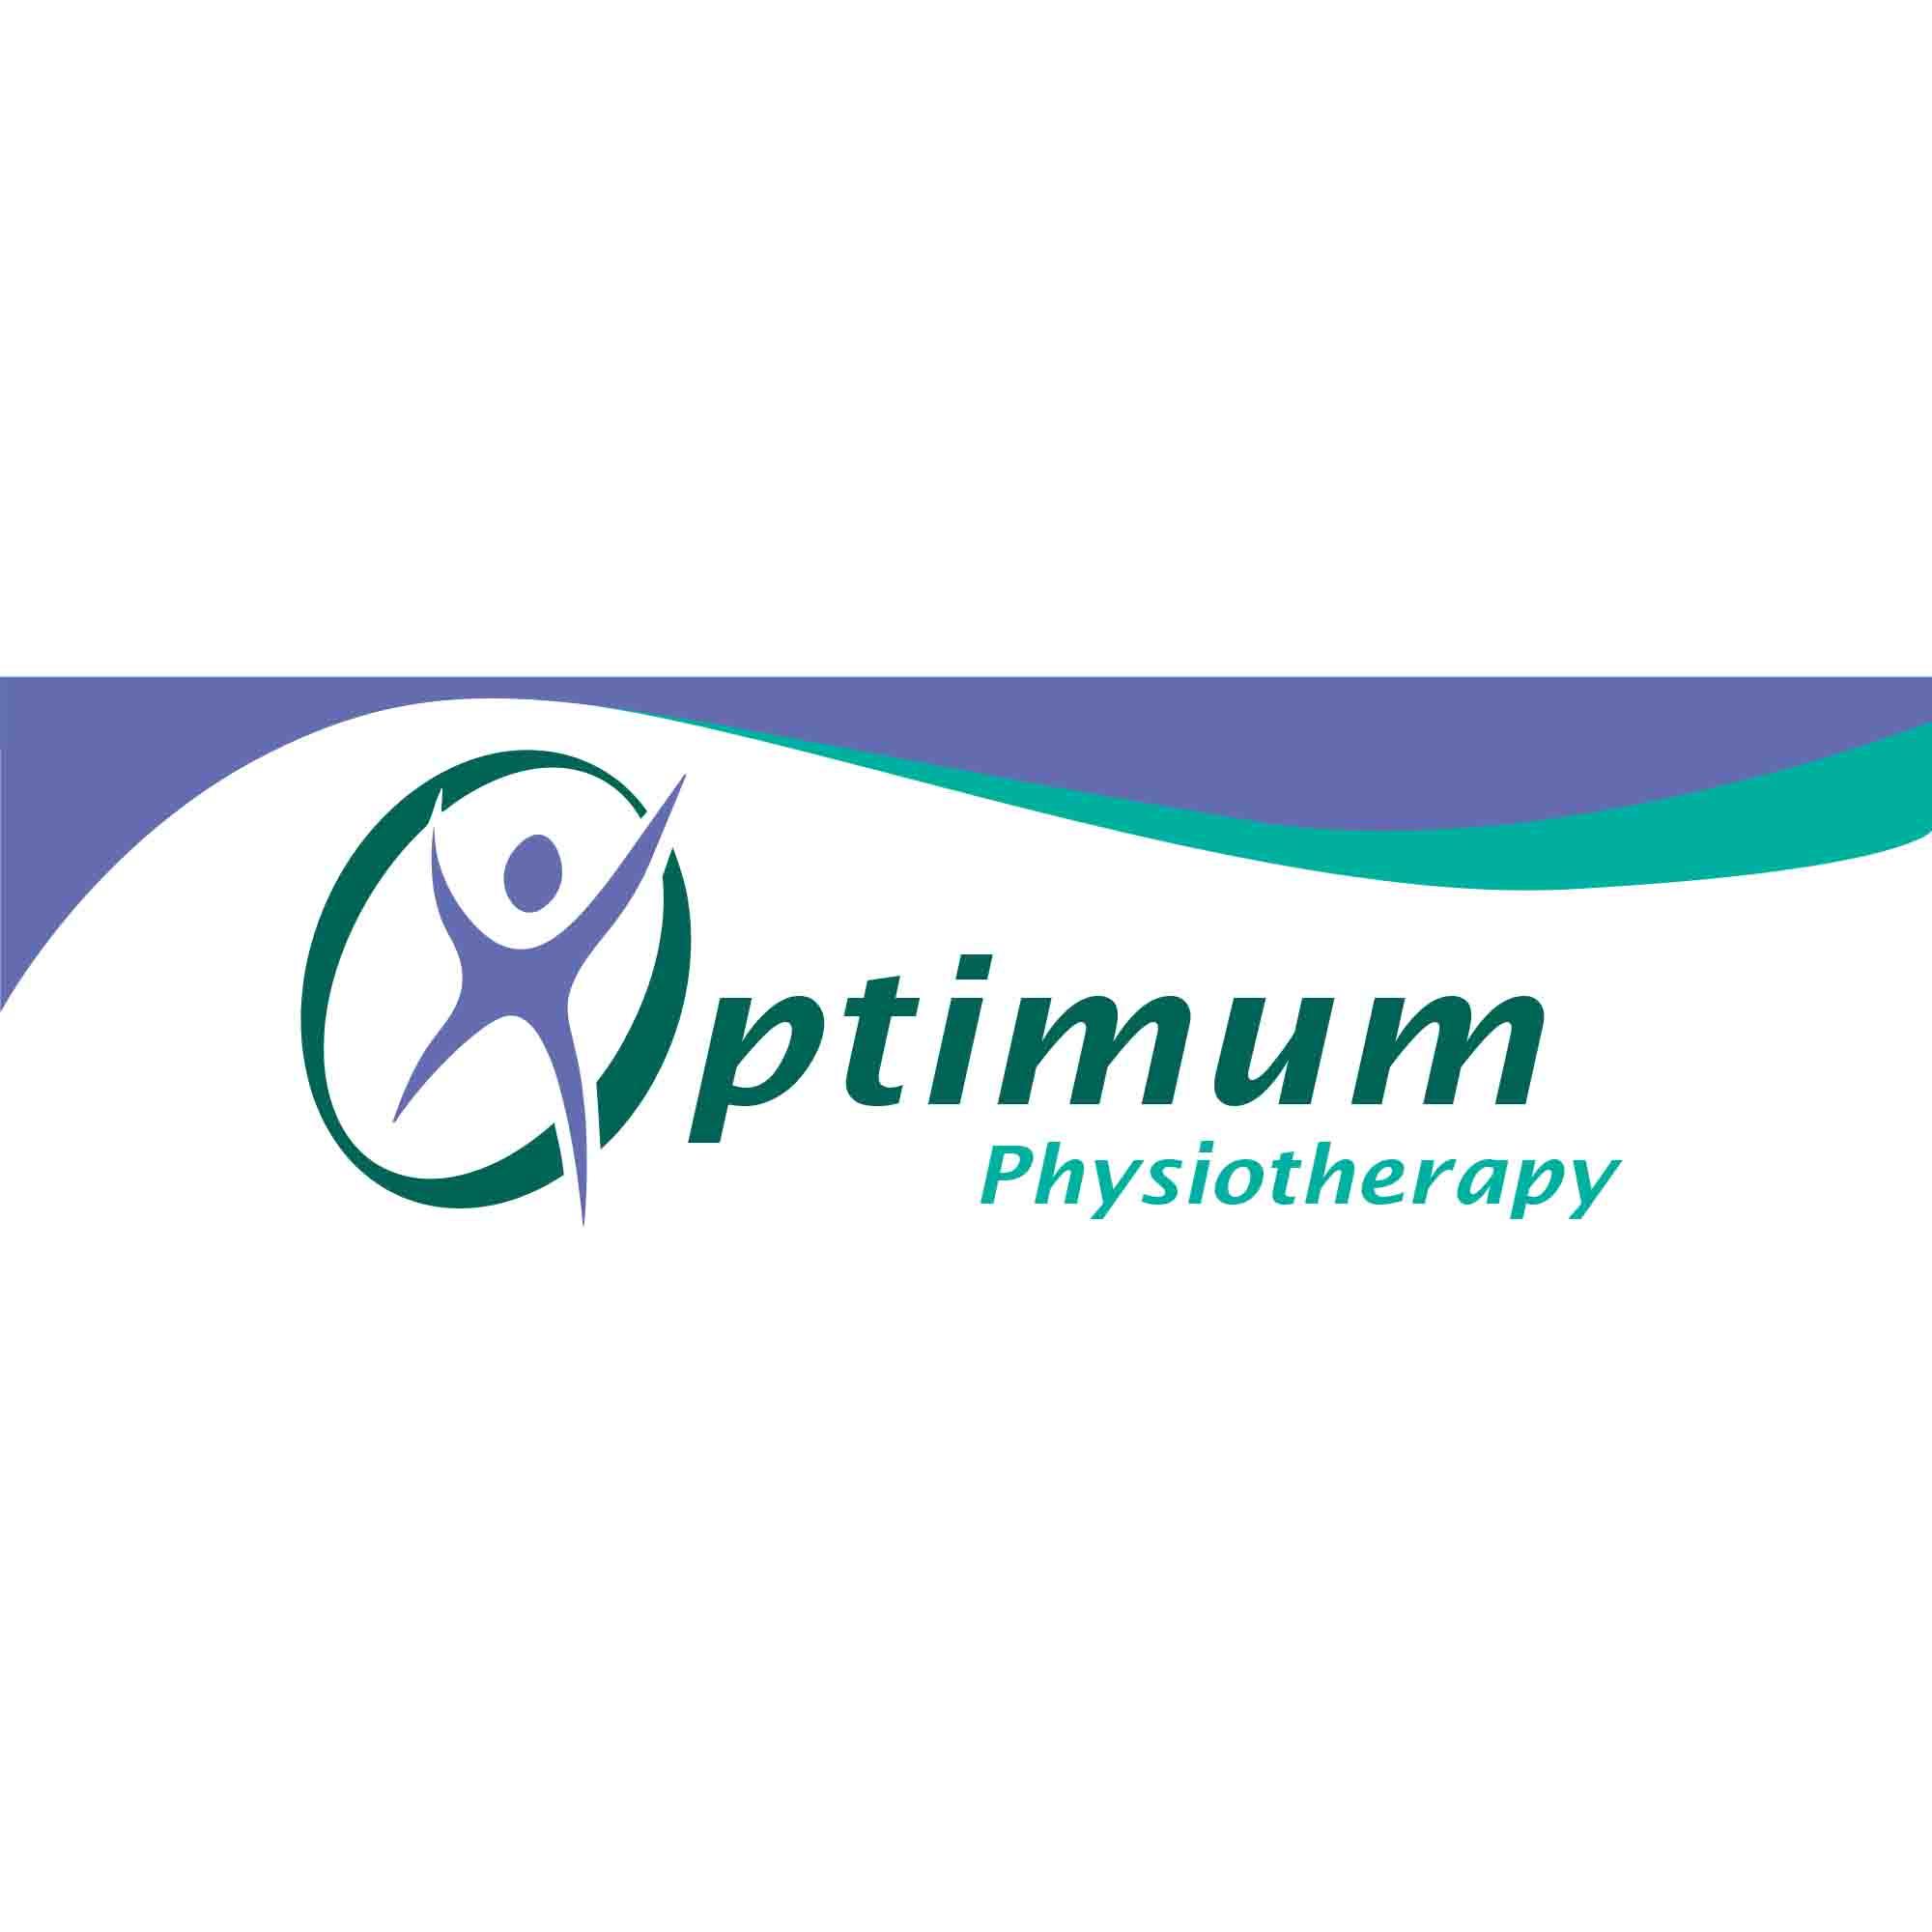 Optimum Physiology - logo/banner